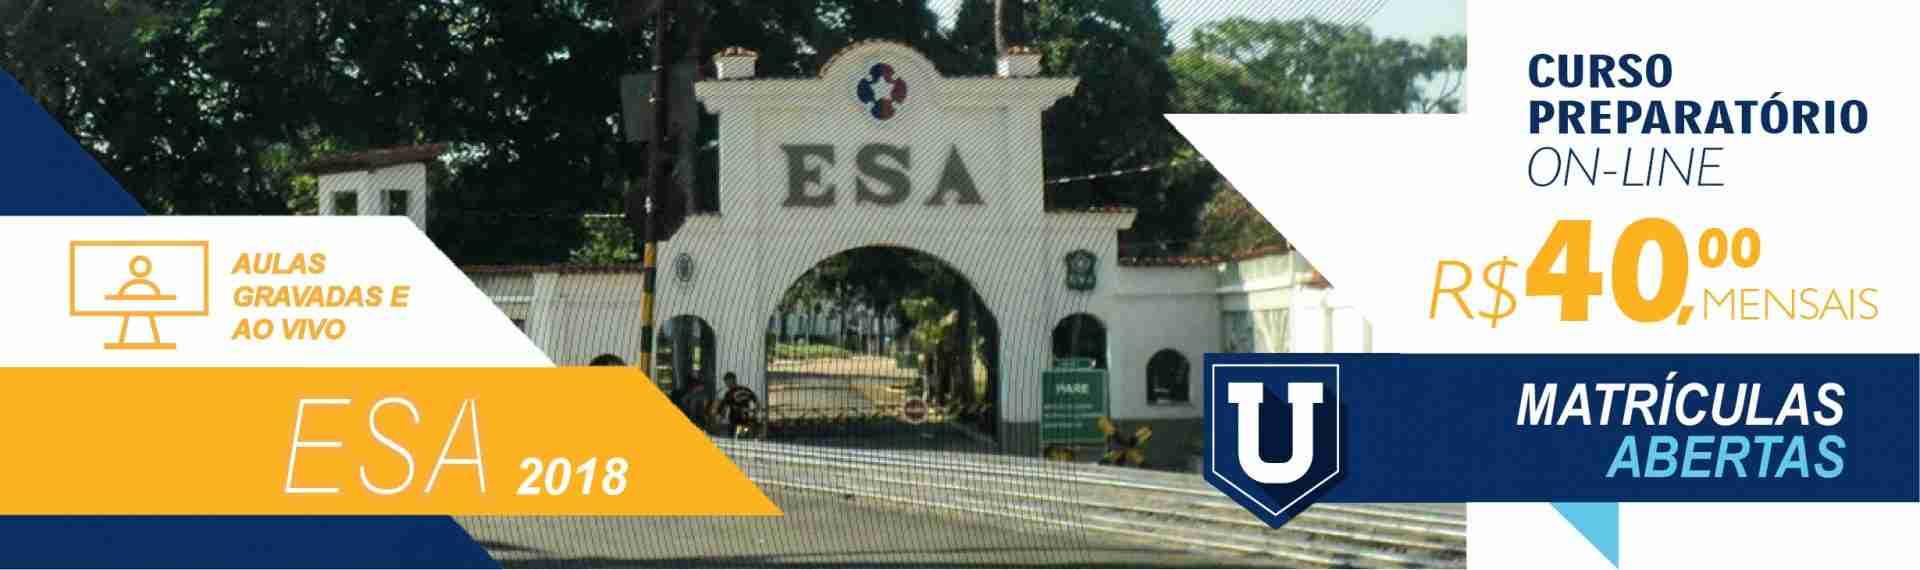 Banner-Site ESA 2018